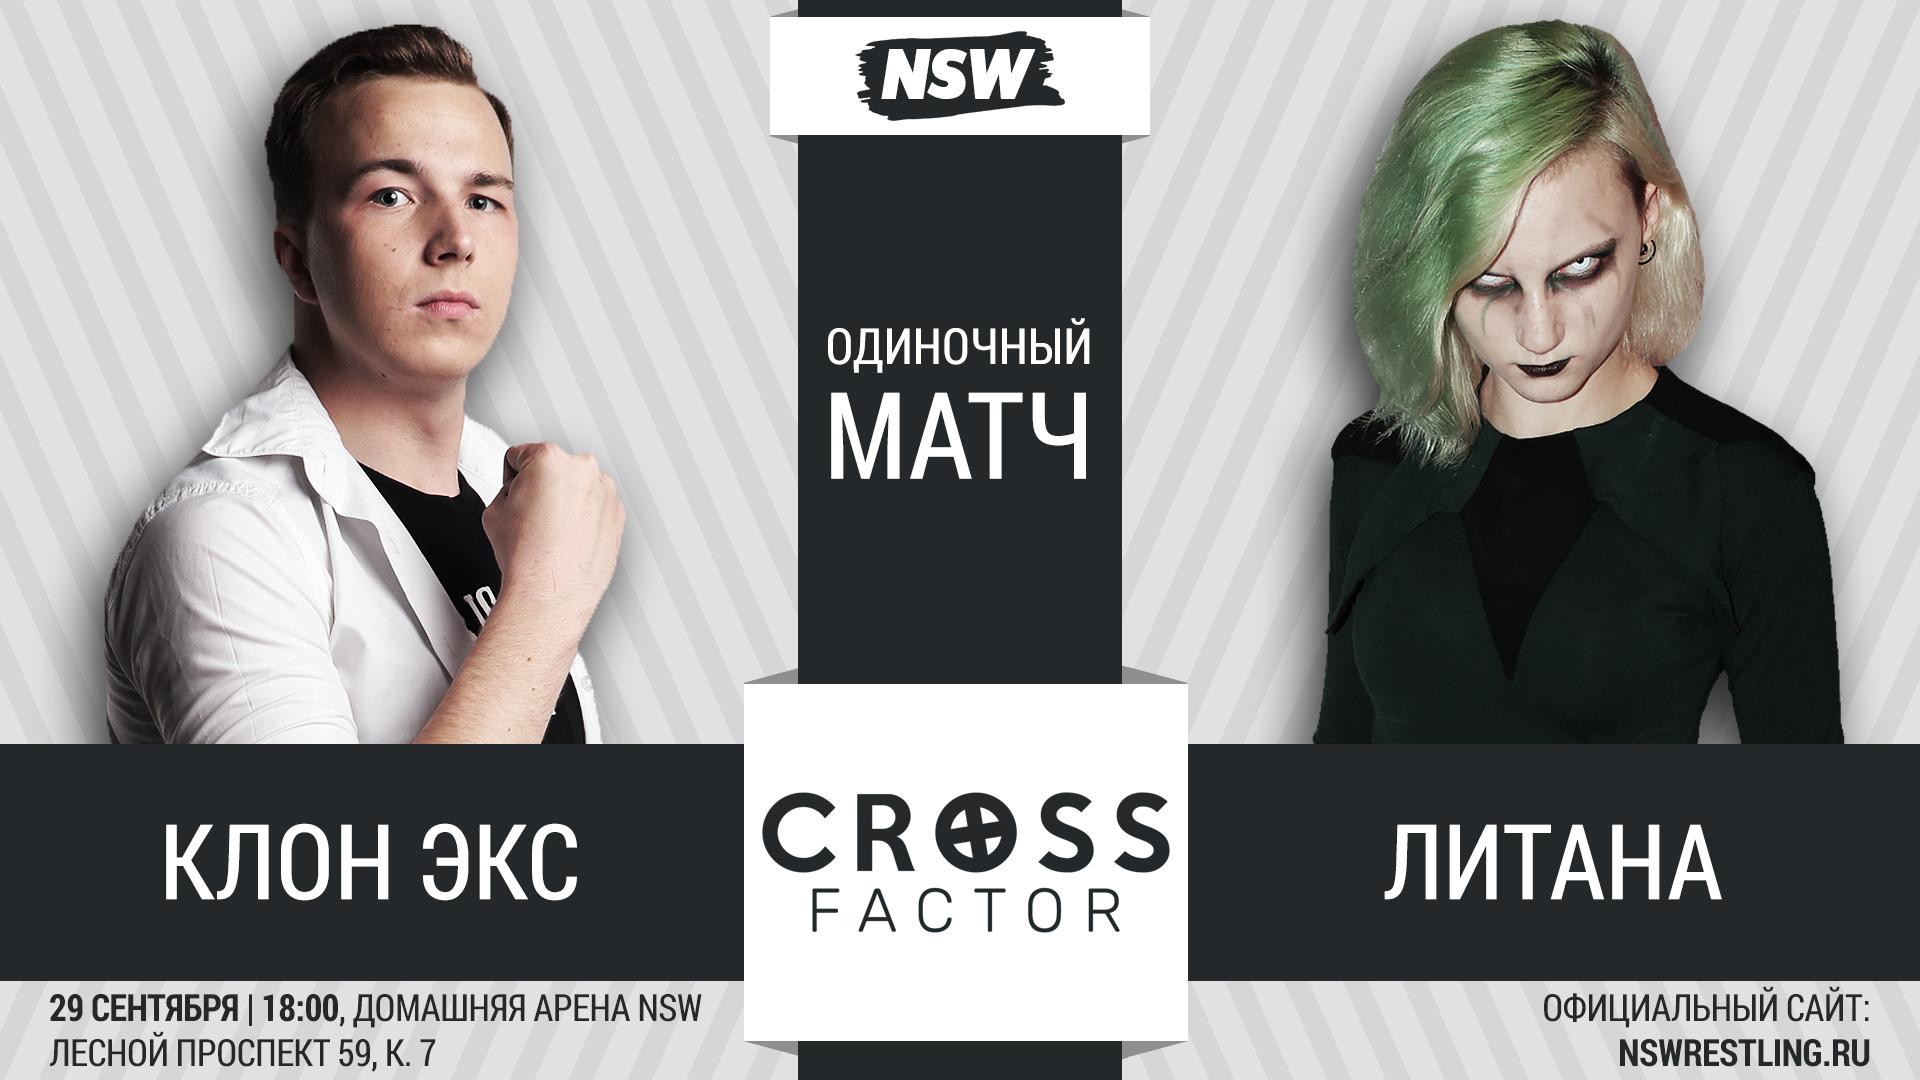 NSW Cross Factor (29/09): Клон Экс против Литаны